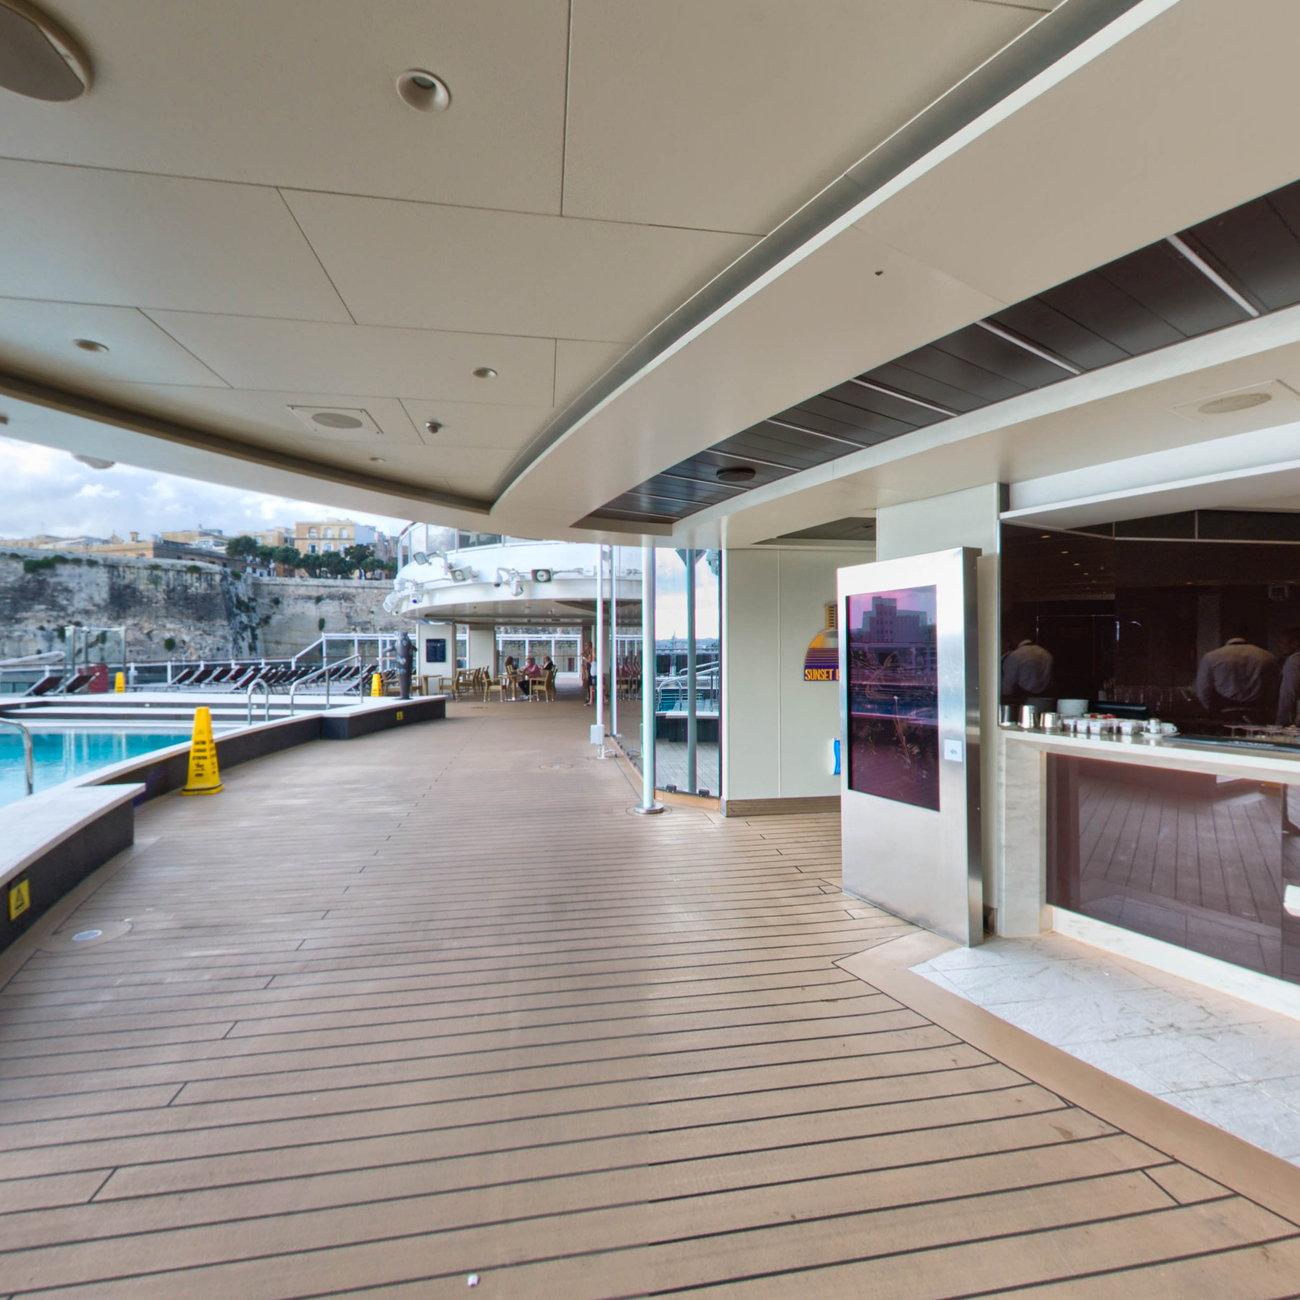 Sunset Beach Bar on MSC Seaview Cruise Ship - Cruise Critic